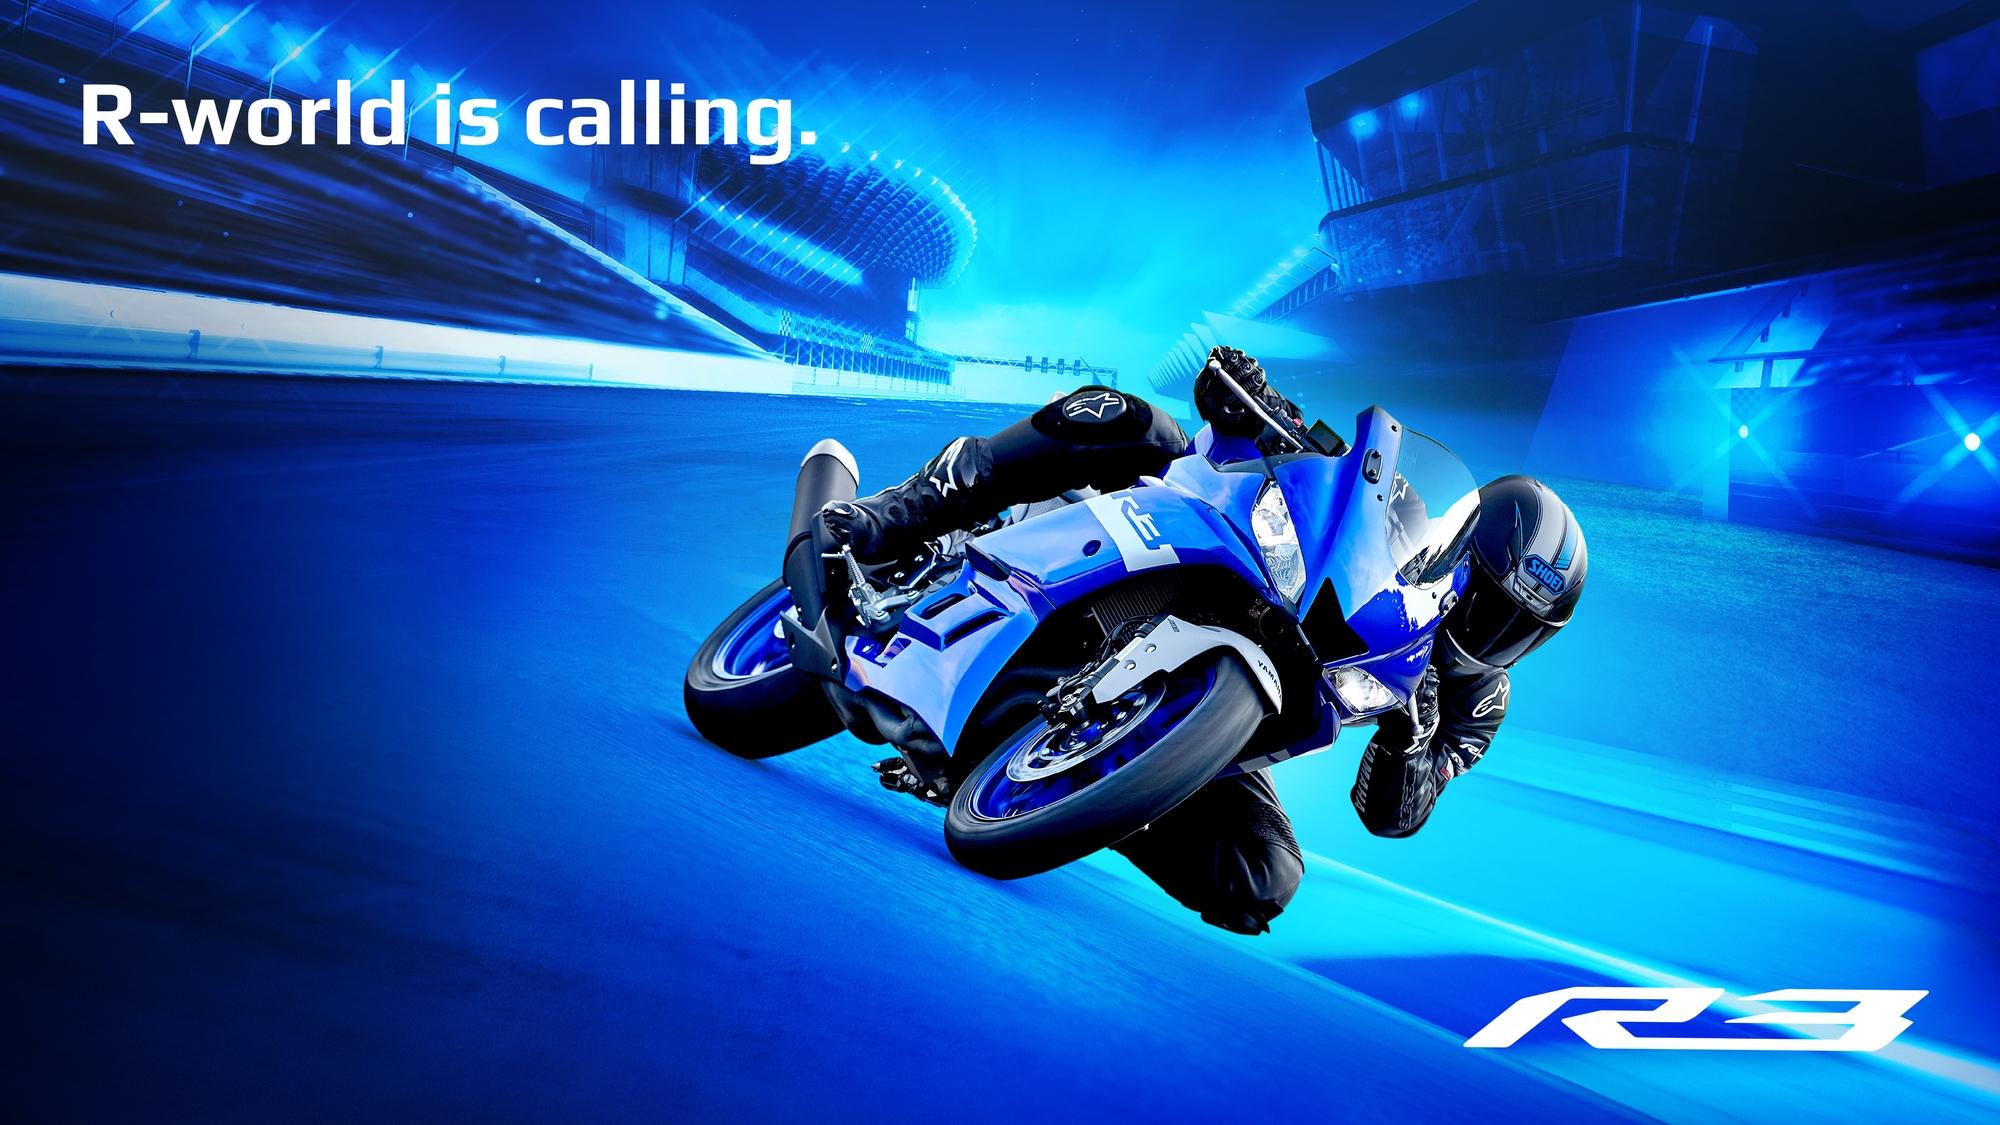 YZF-R3 - motorcycles - Yamaha Motor